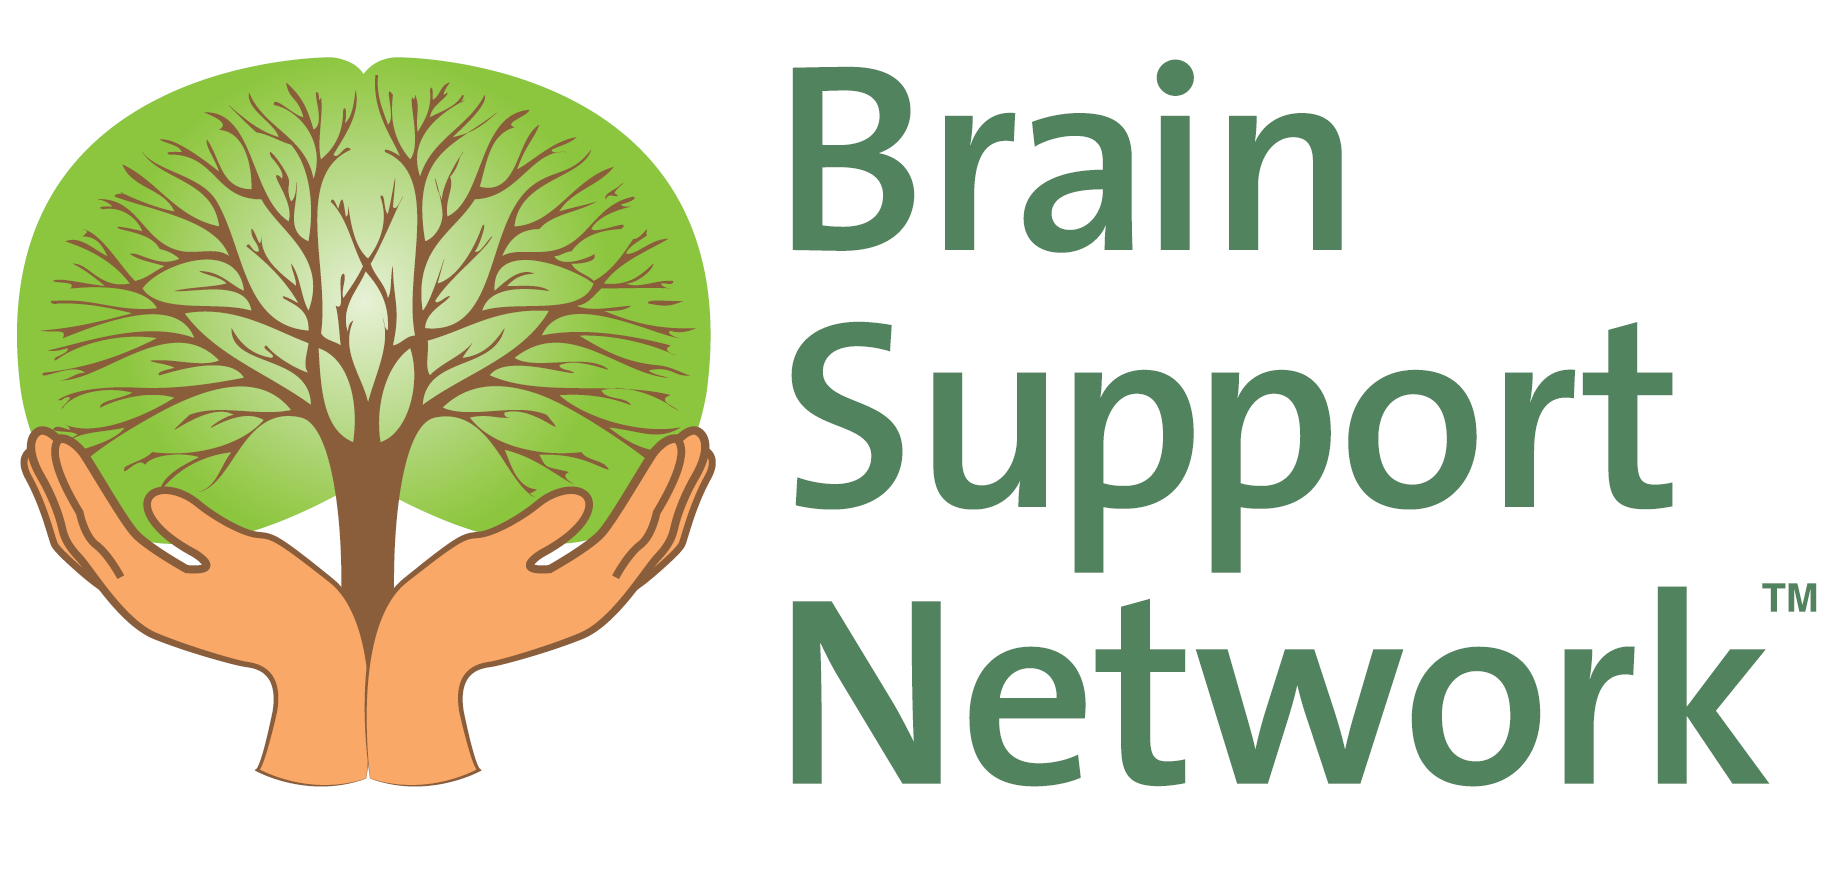 brain support network brain support network logos